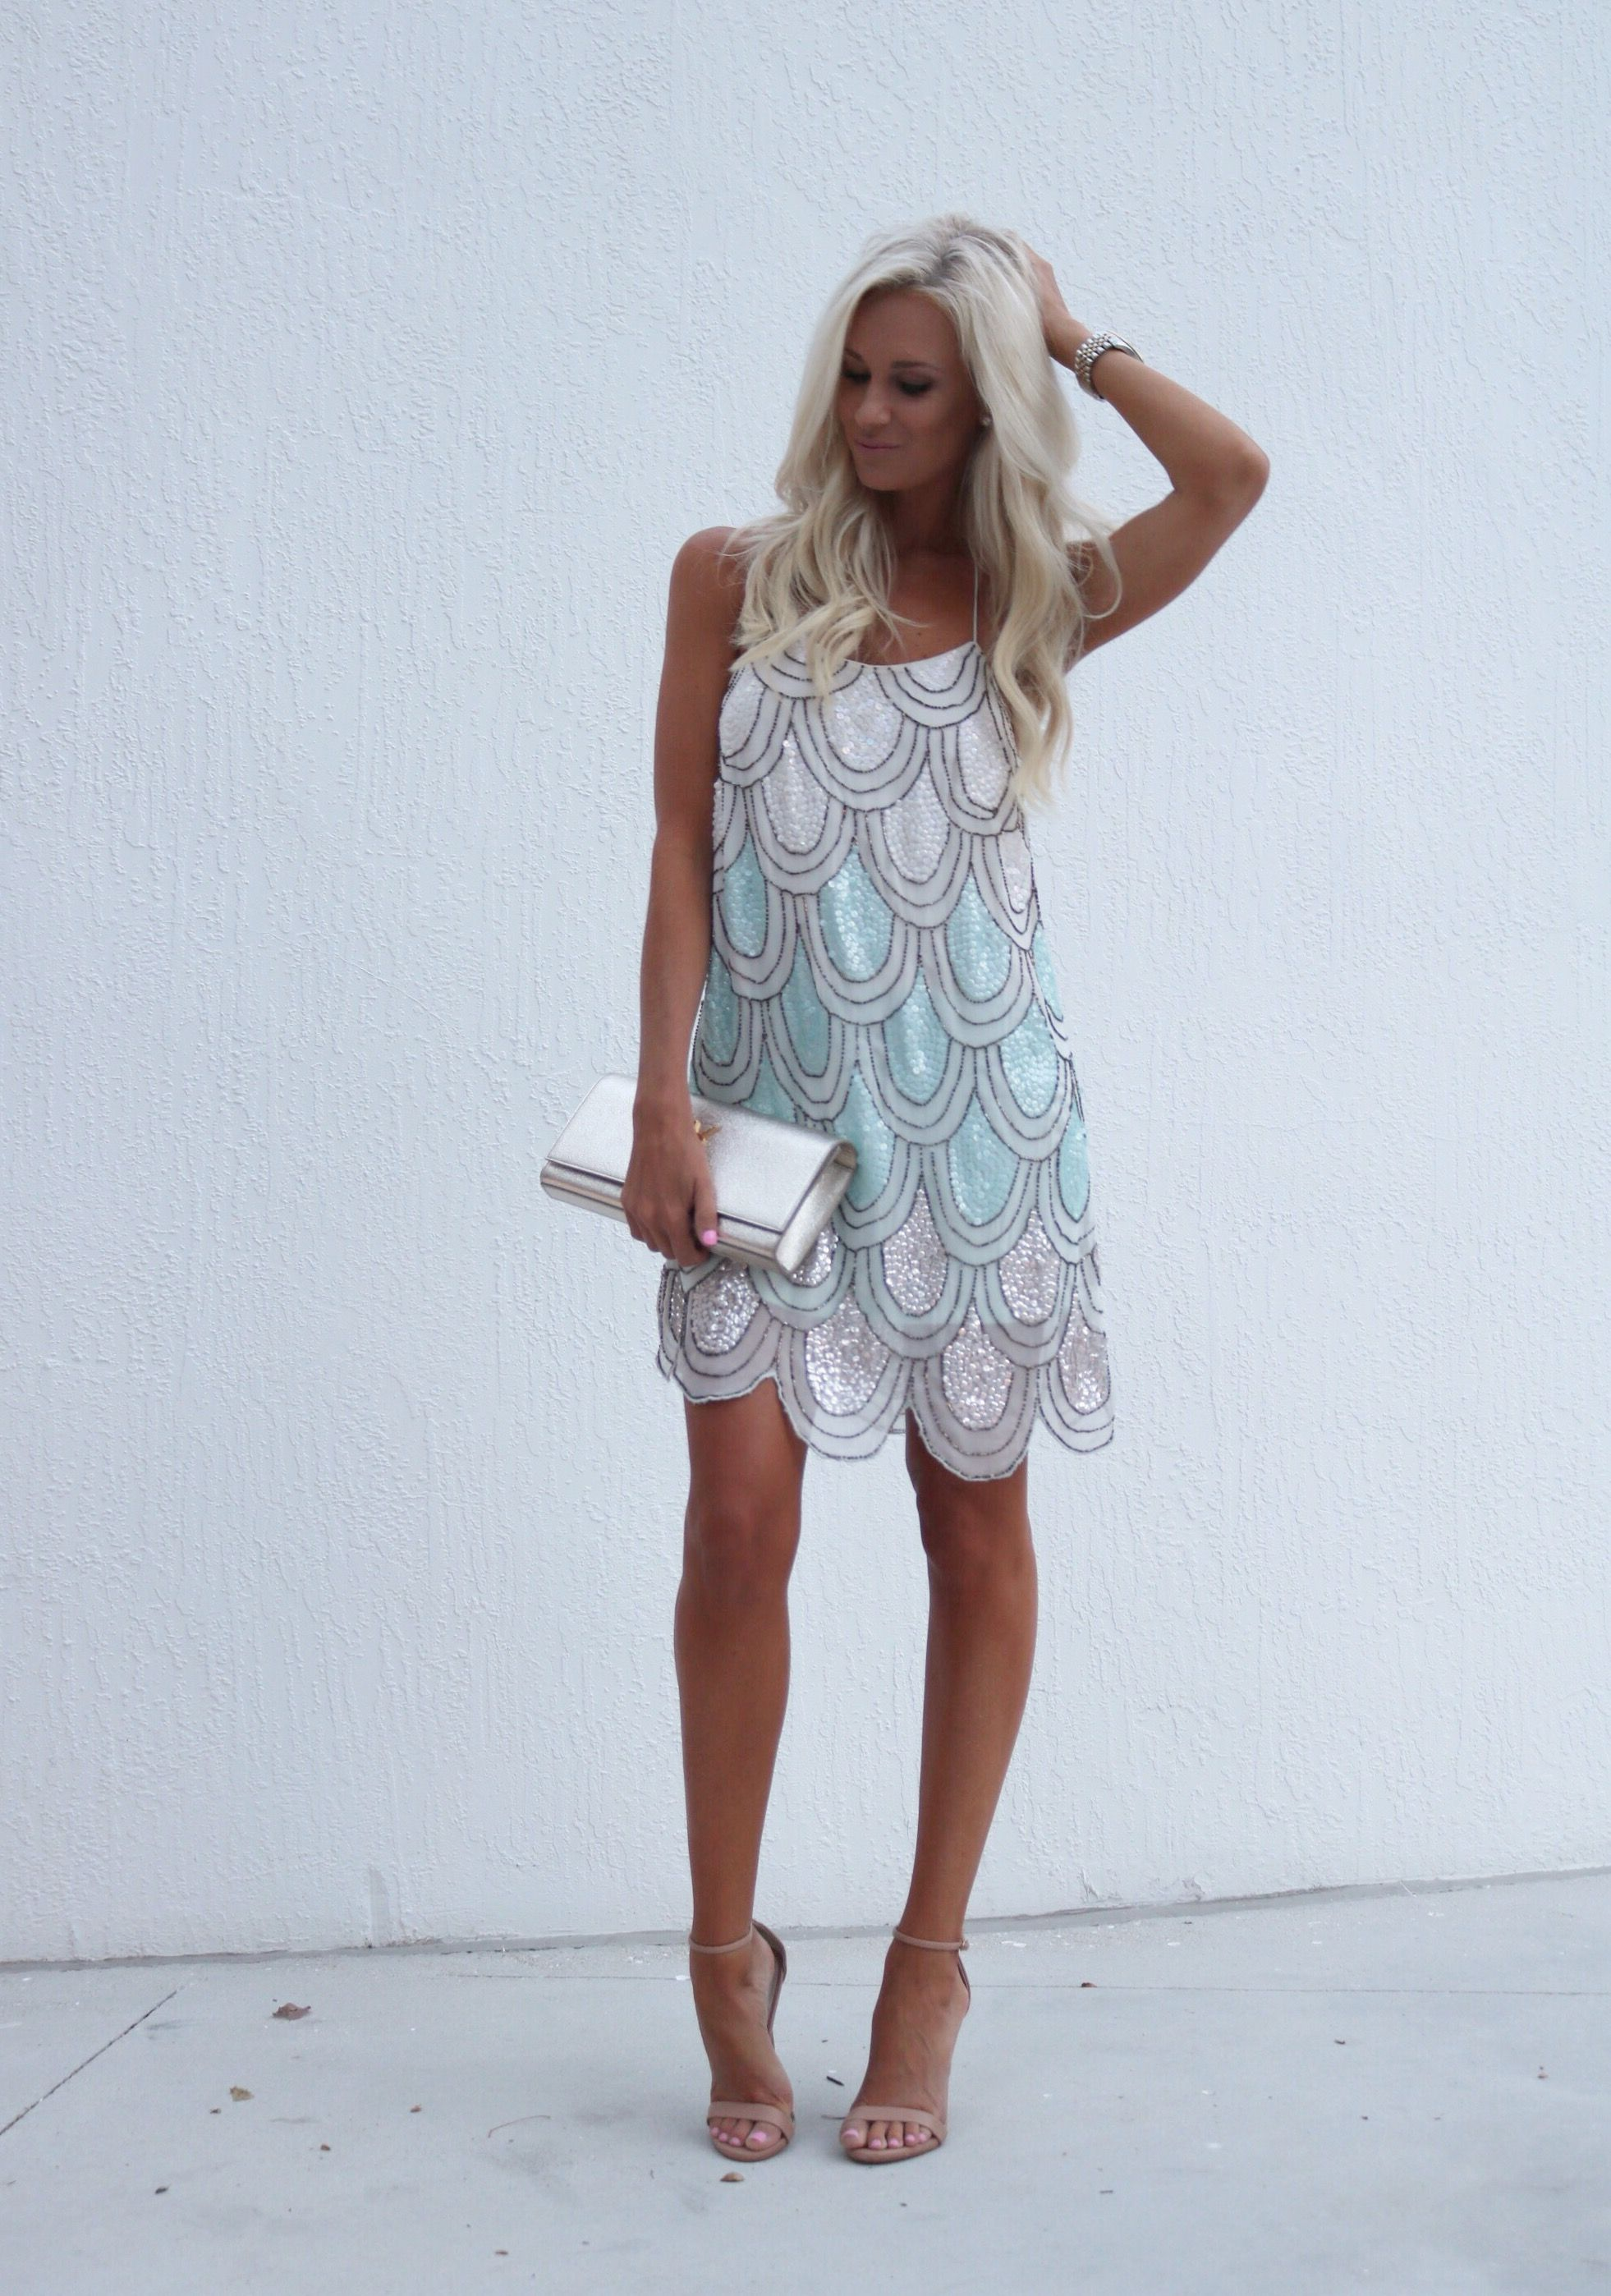 a6903c6ec4cc Dress  NBD x Revolve Dame Dress c o